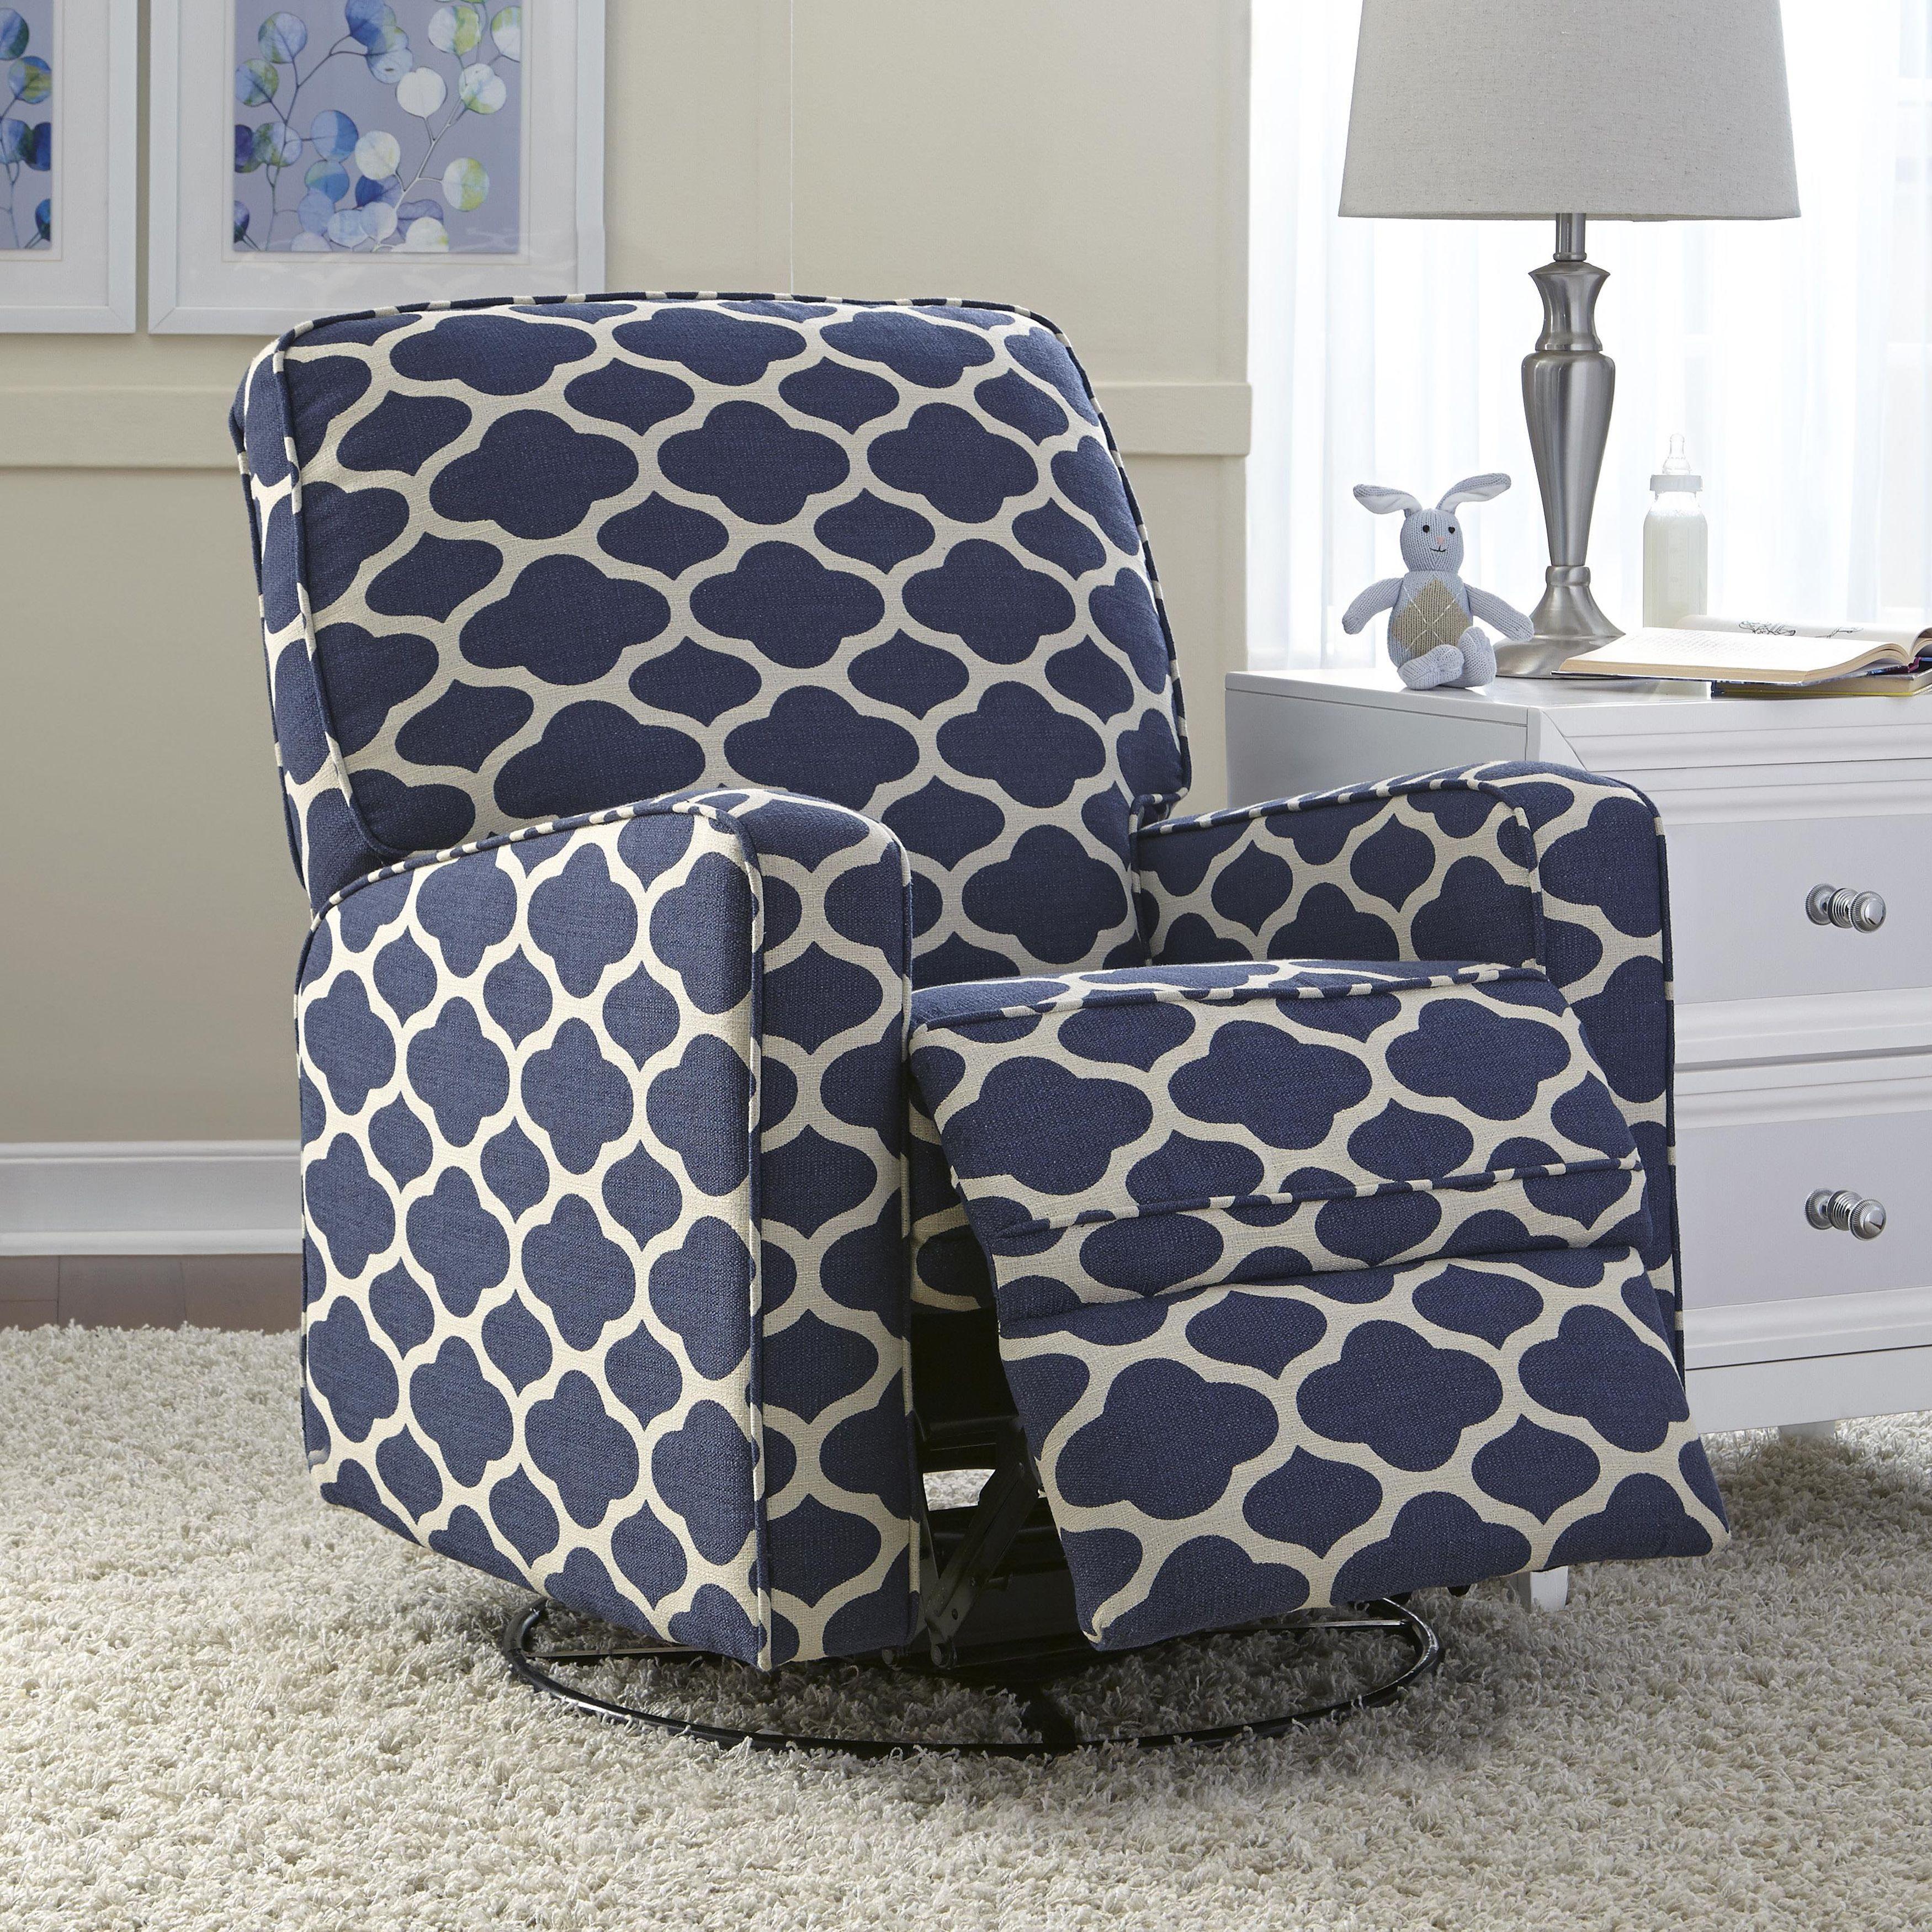 Furniture swivel and tub chairs dori fabric swivel cuddle chair - Leo Blue Nursery Swivel Glider Recliner Chair